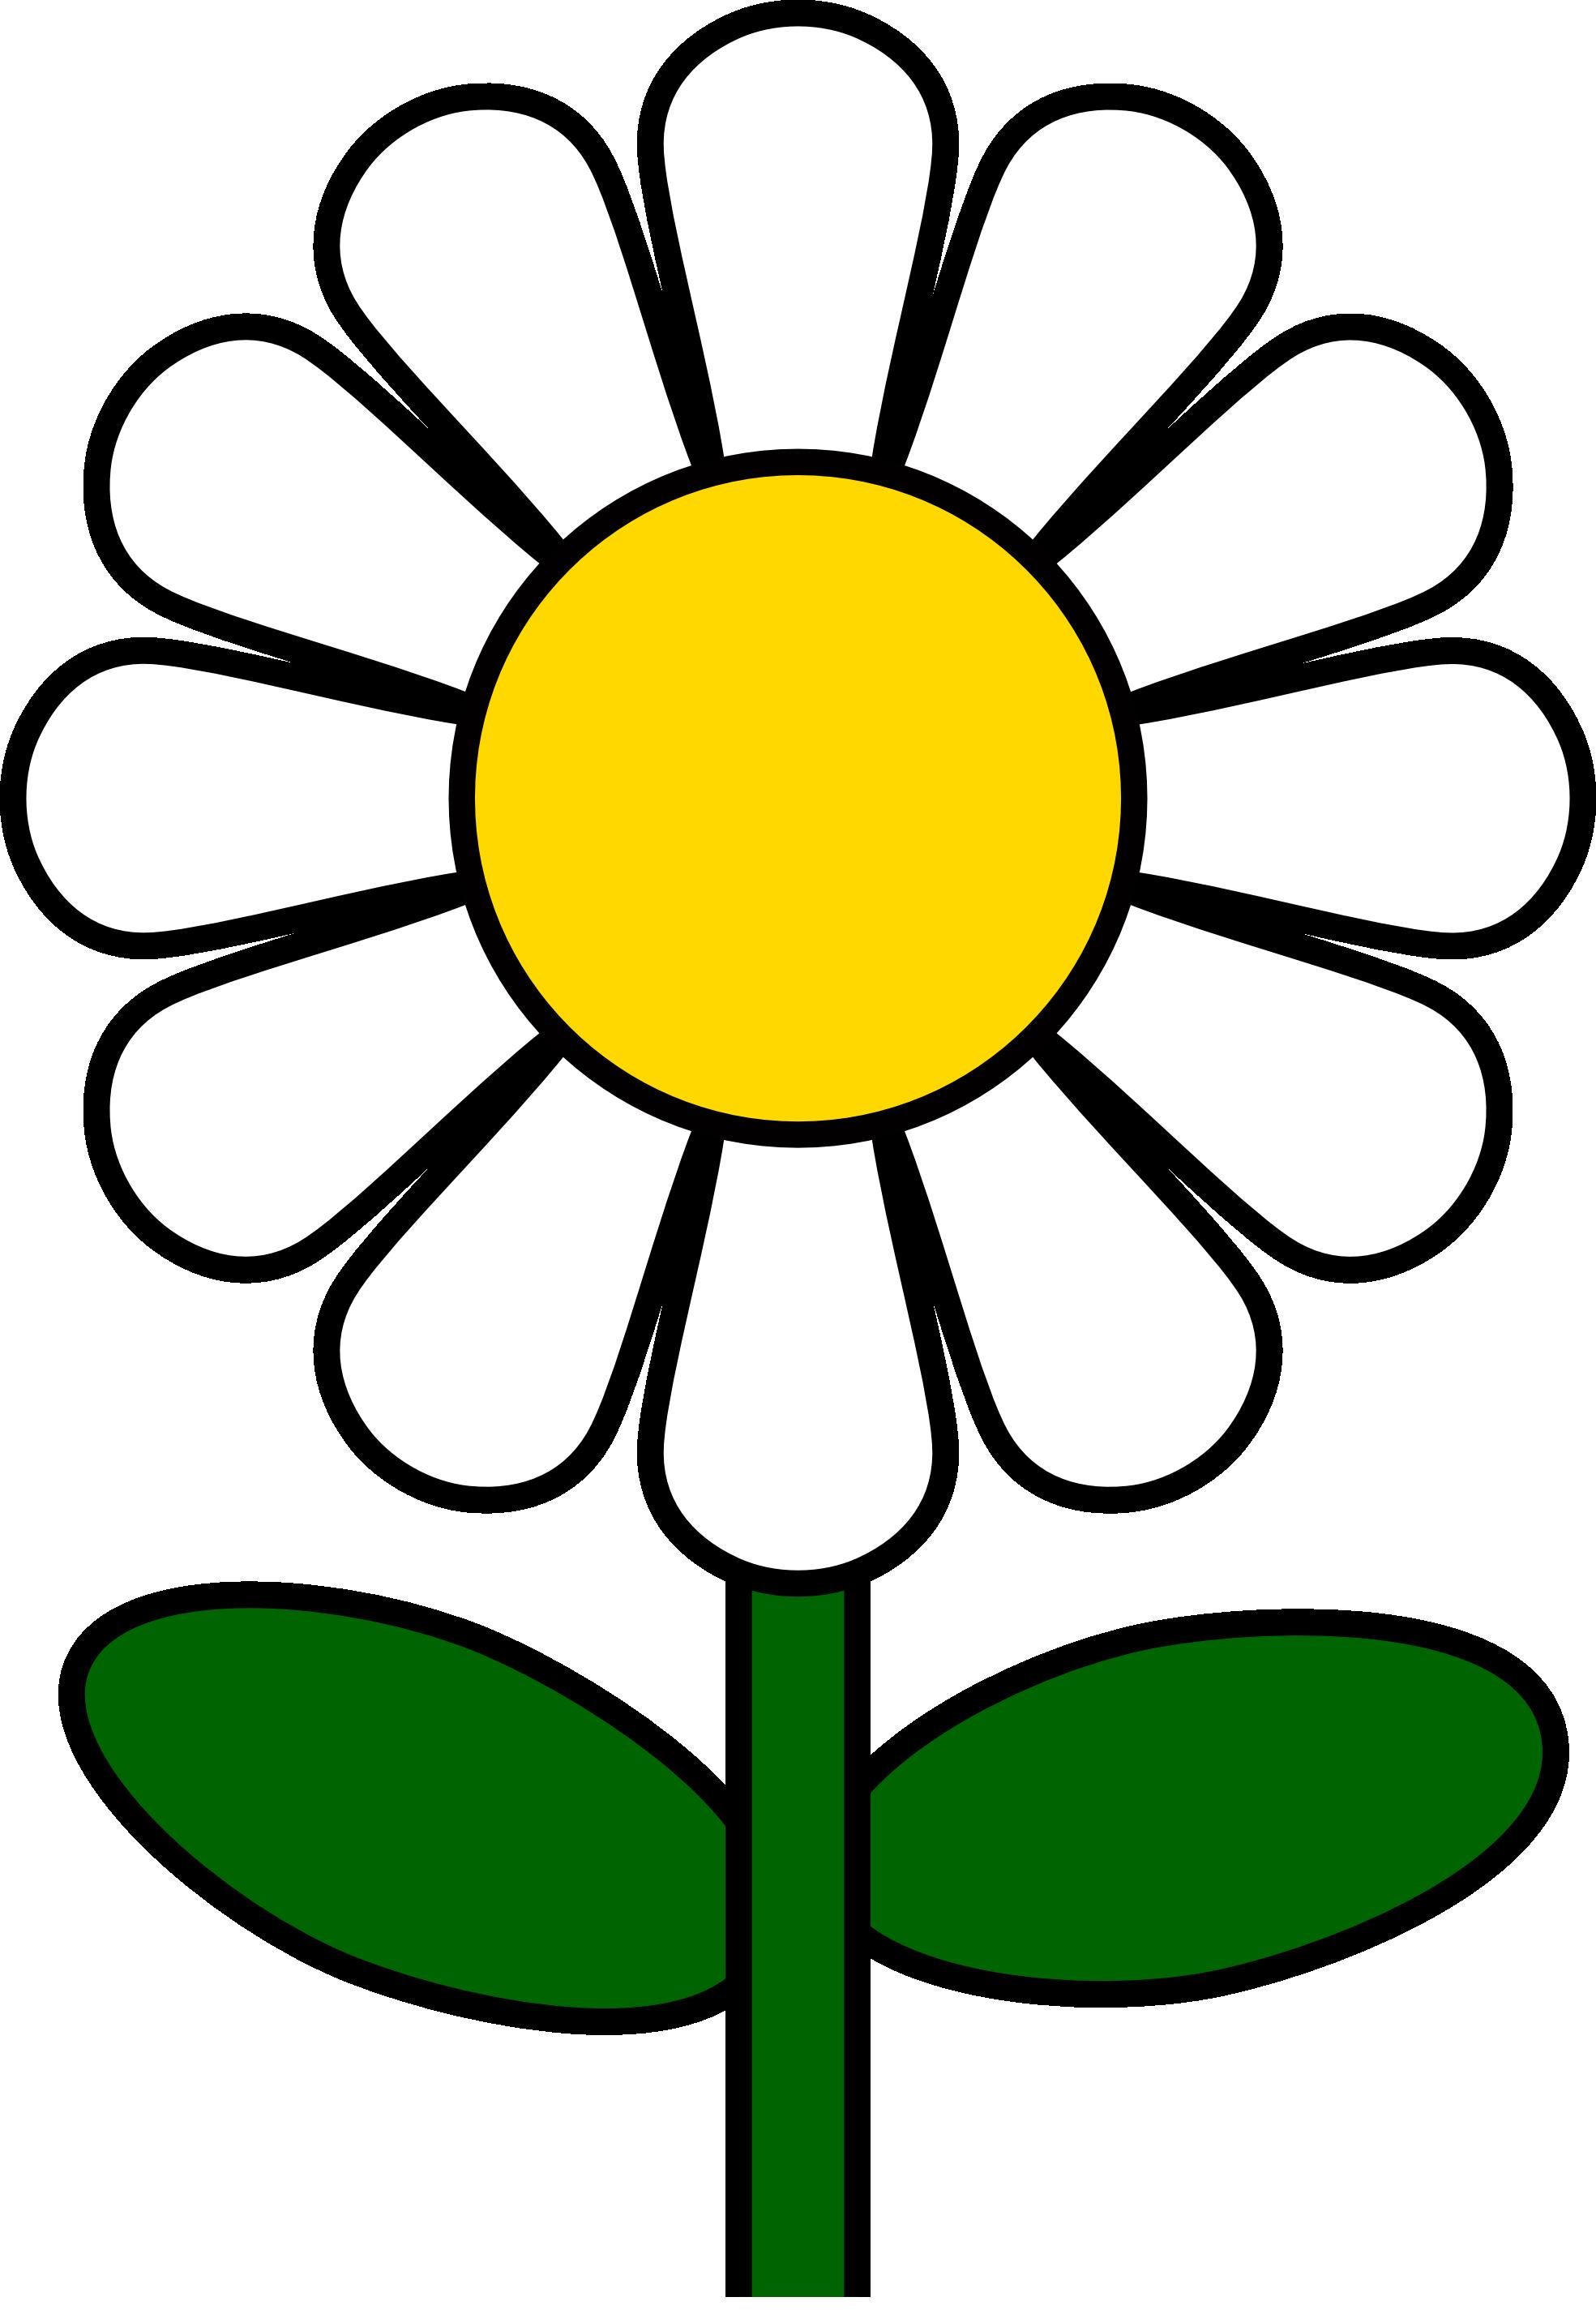 Daisy Flower Clip Art-Daisy Flower Clip Art-8